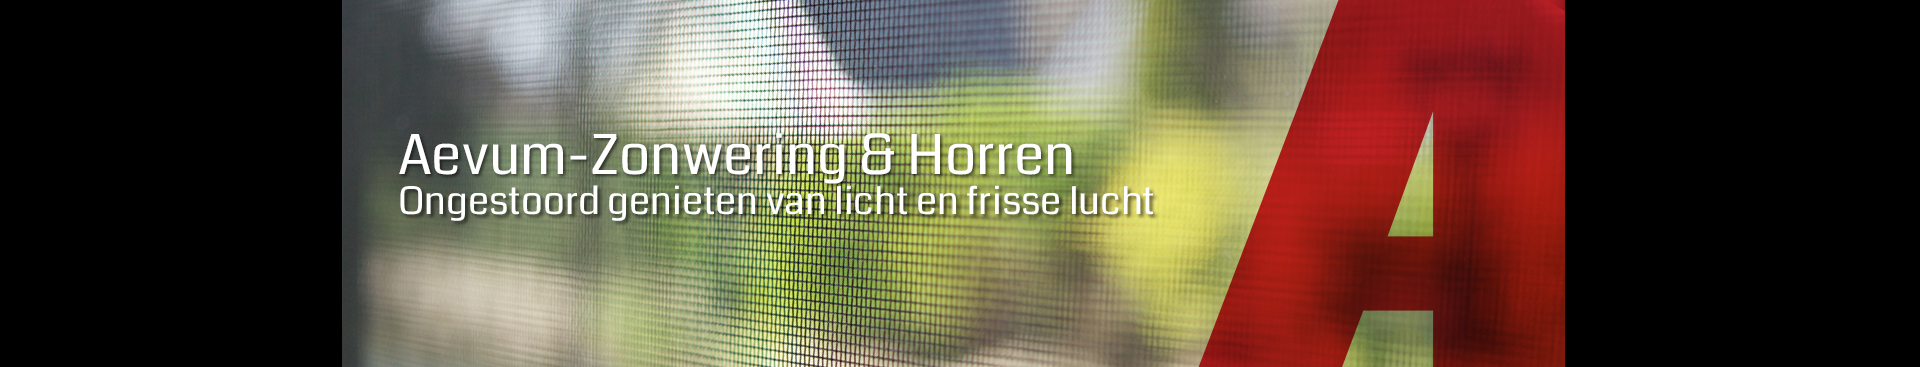 Aevum_Zonwering&Horren